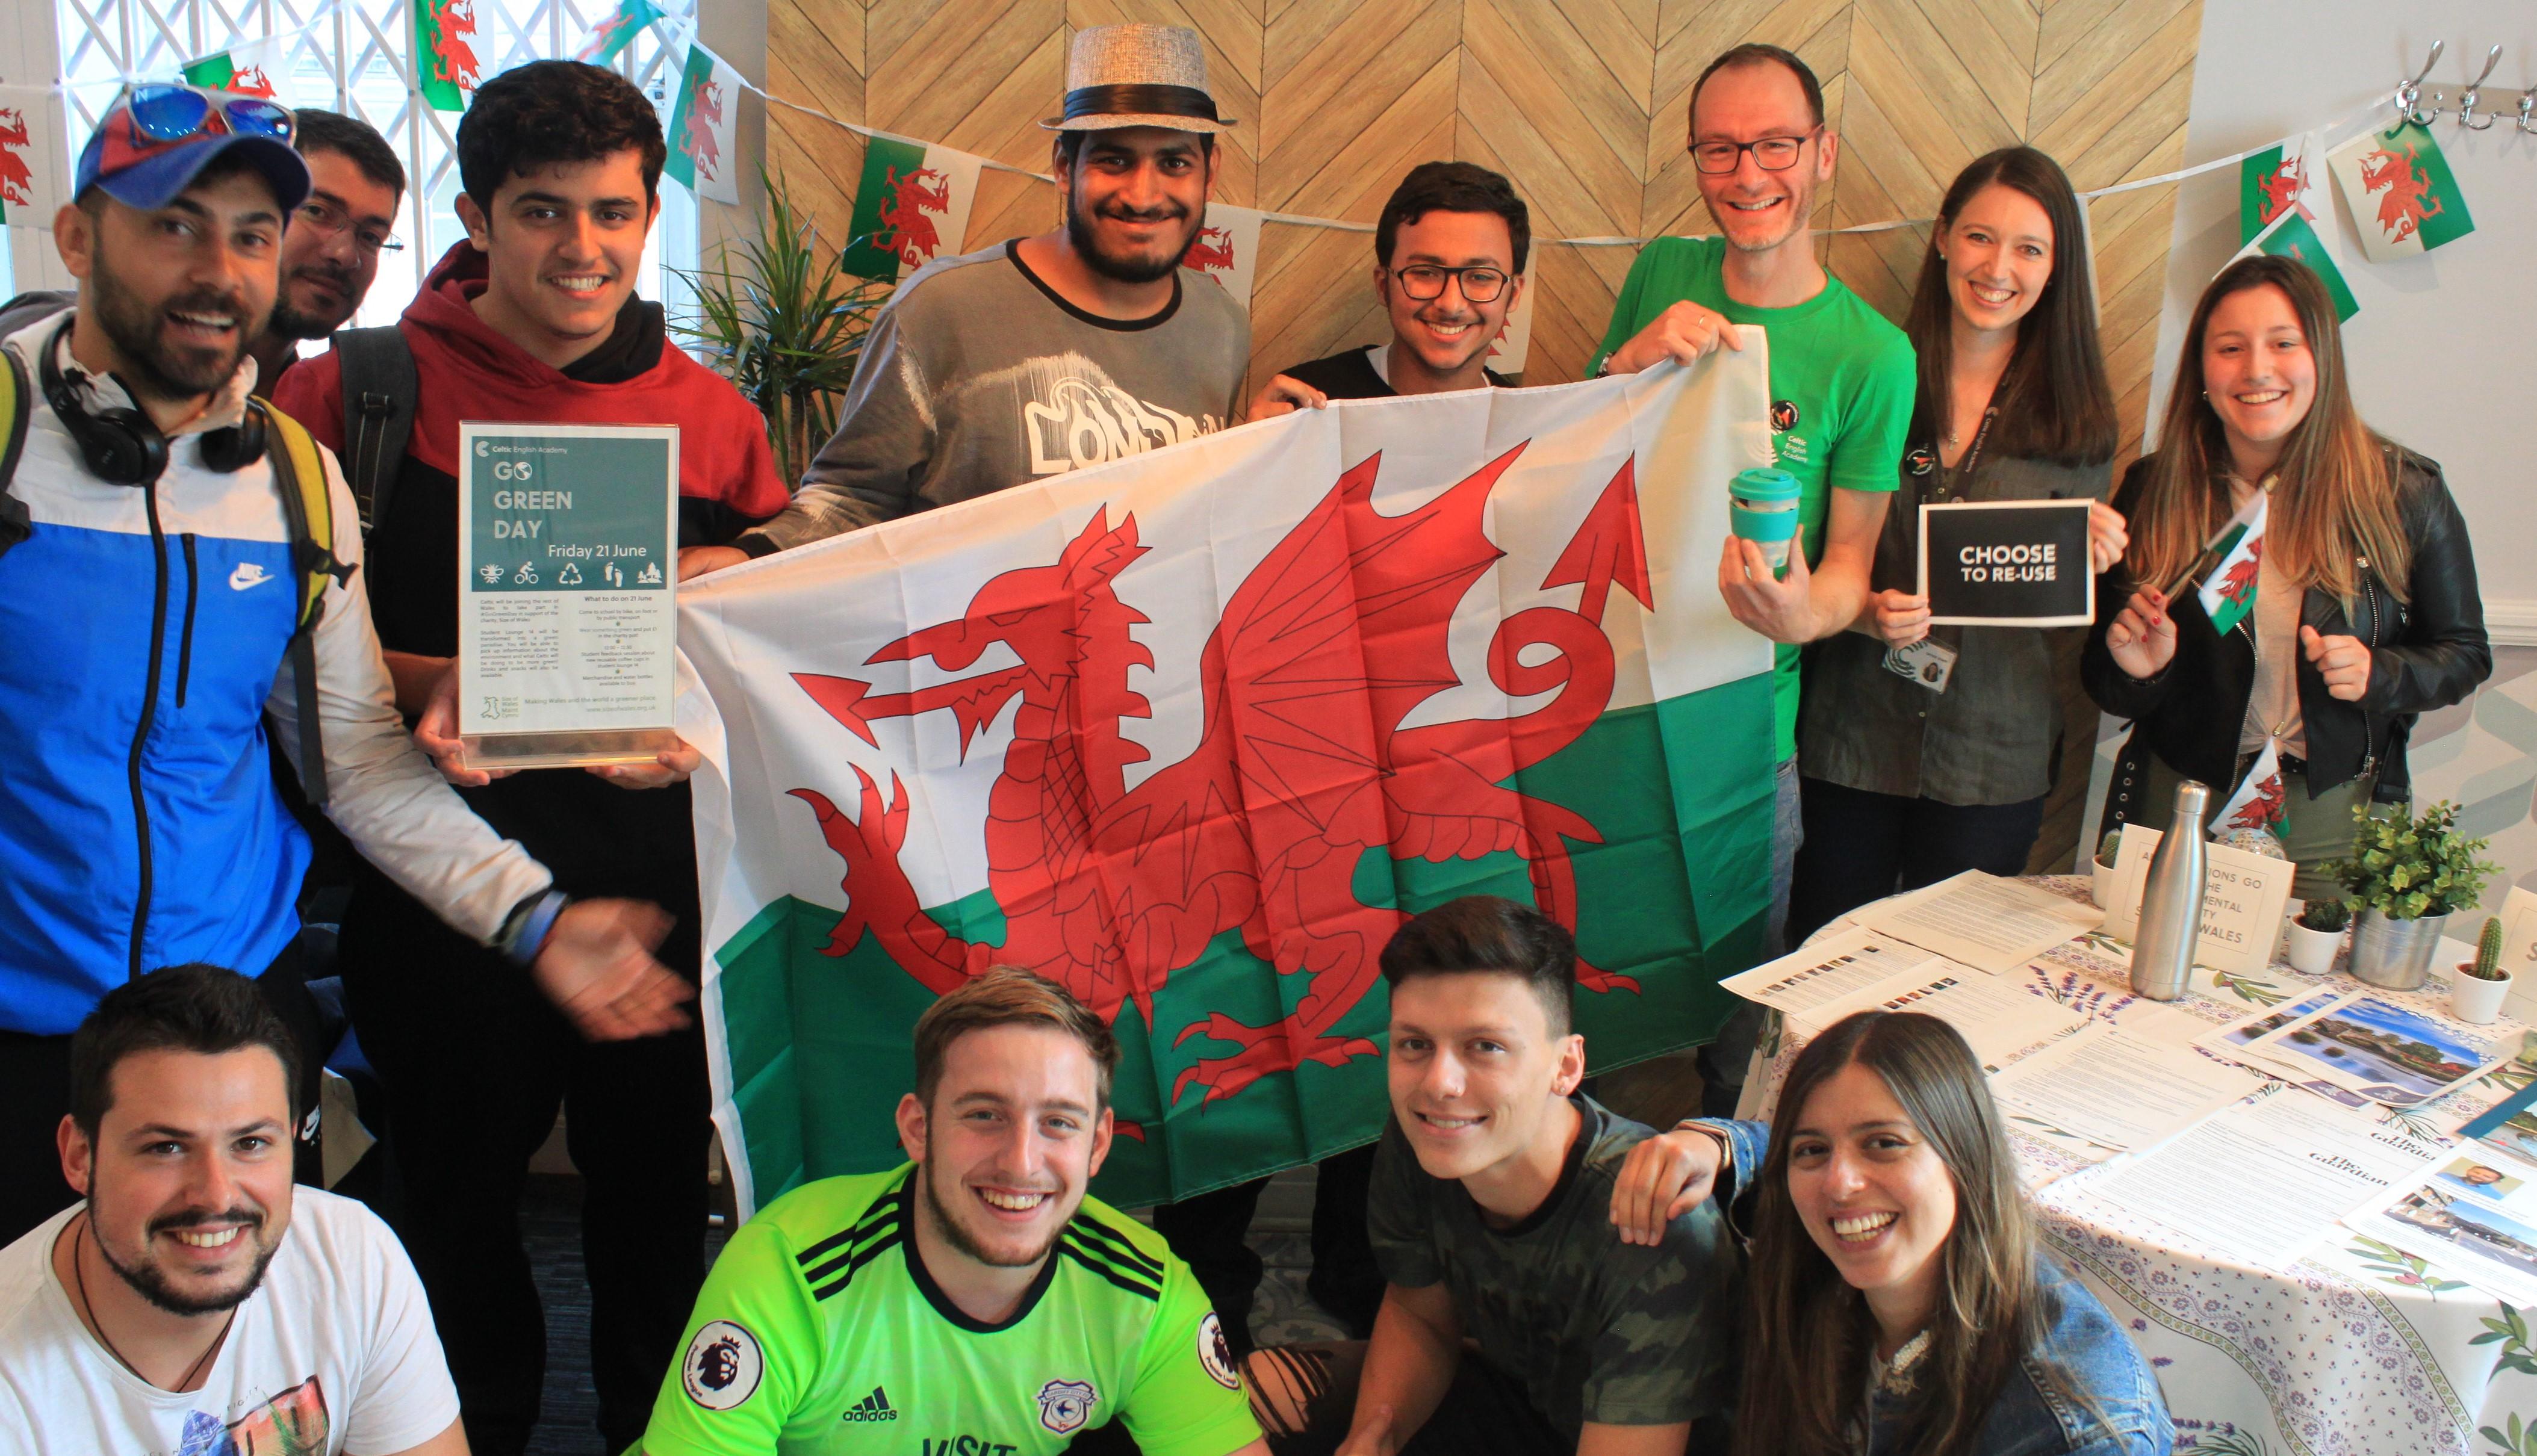 Globally Responsible Wales